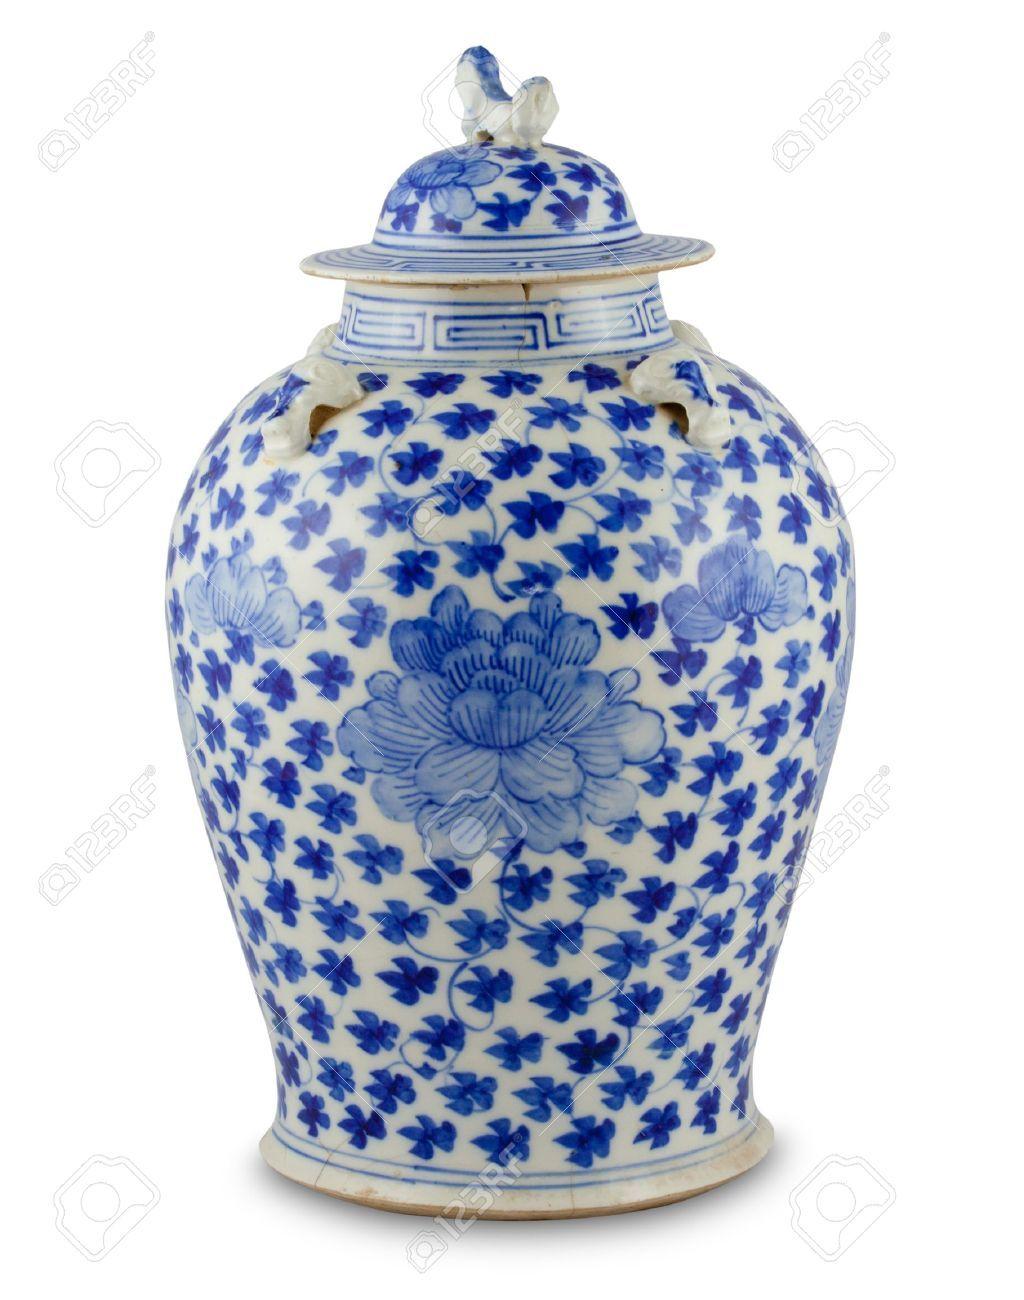 9837623 chinese antique vase on the plain back ground stock photo 9837623 chinese antique vase on the plain back reviewsmspy